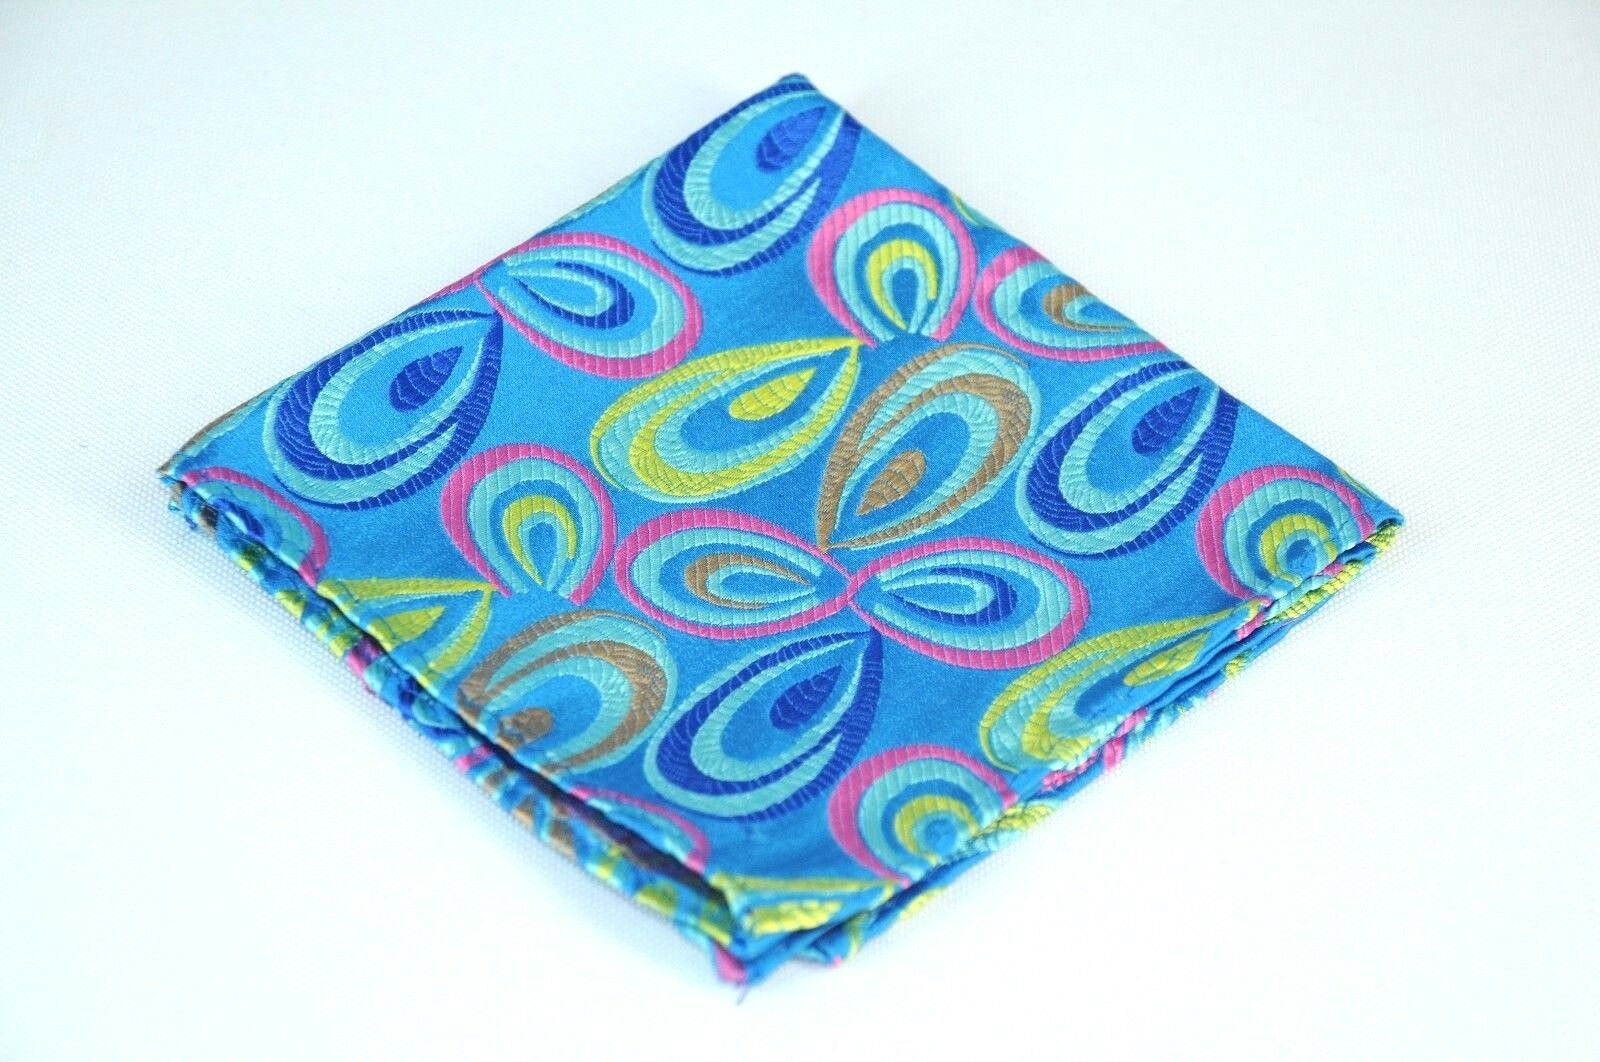 Lord R Colton Masterworks Pocket Square- La Boca Caribbean Silk - Retail New